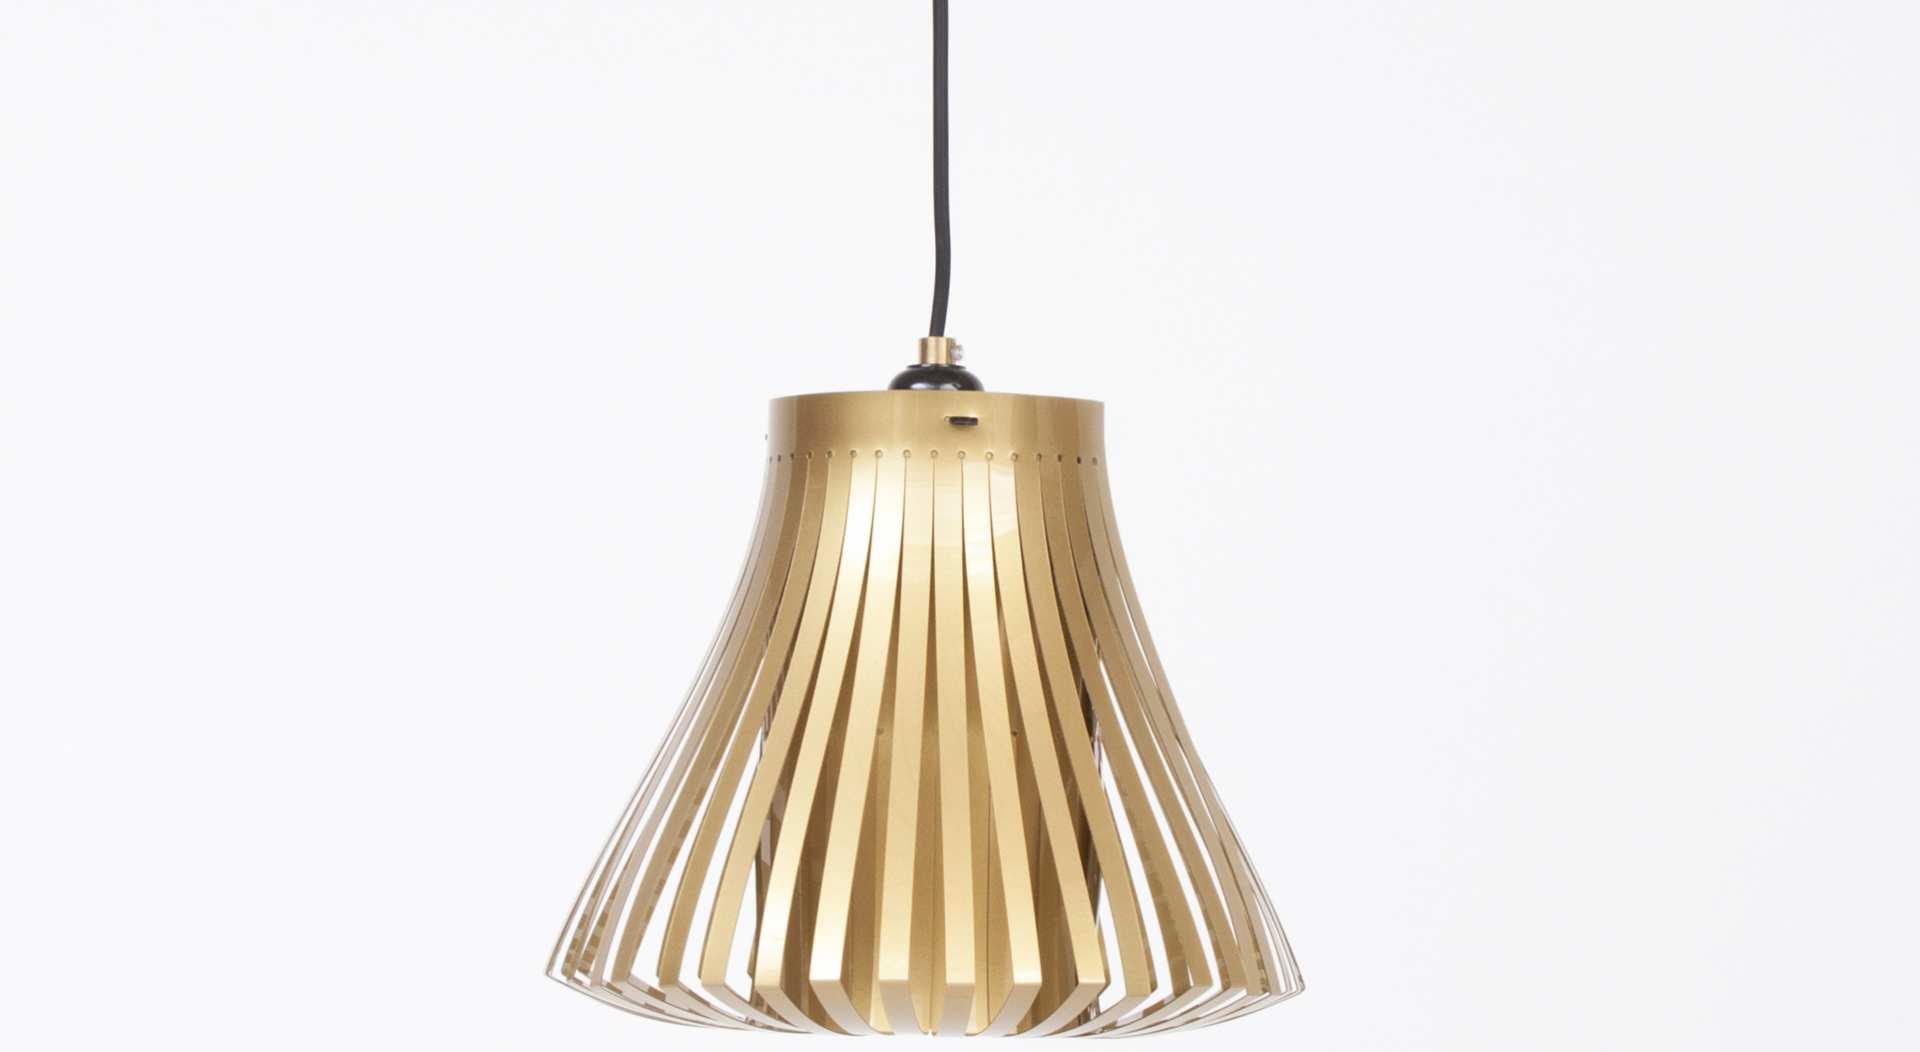 Trias_pendant_light_design_paula_arntzen_gold